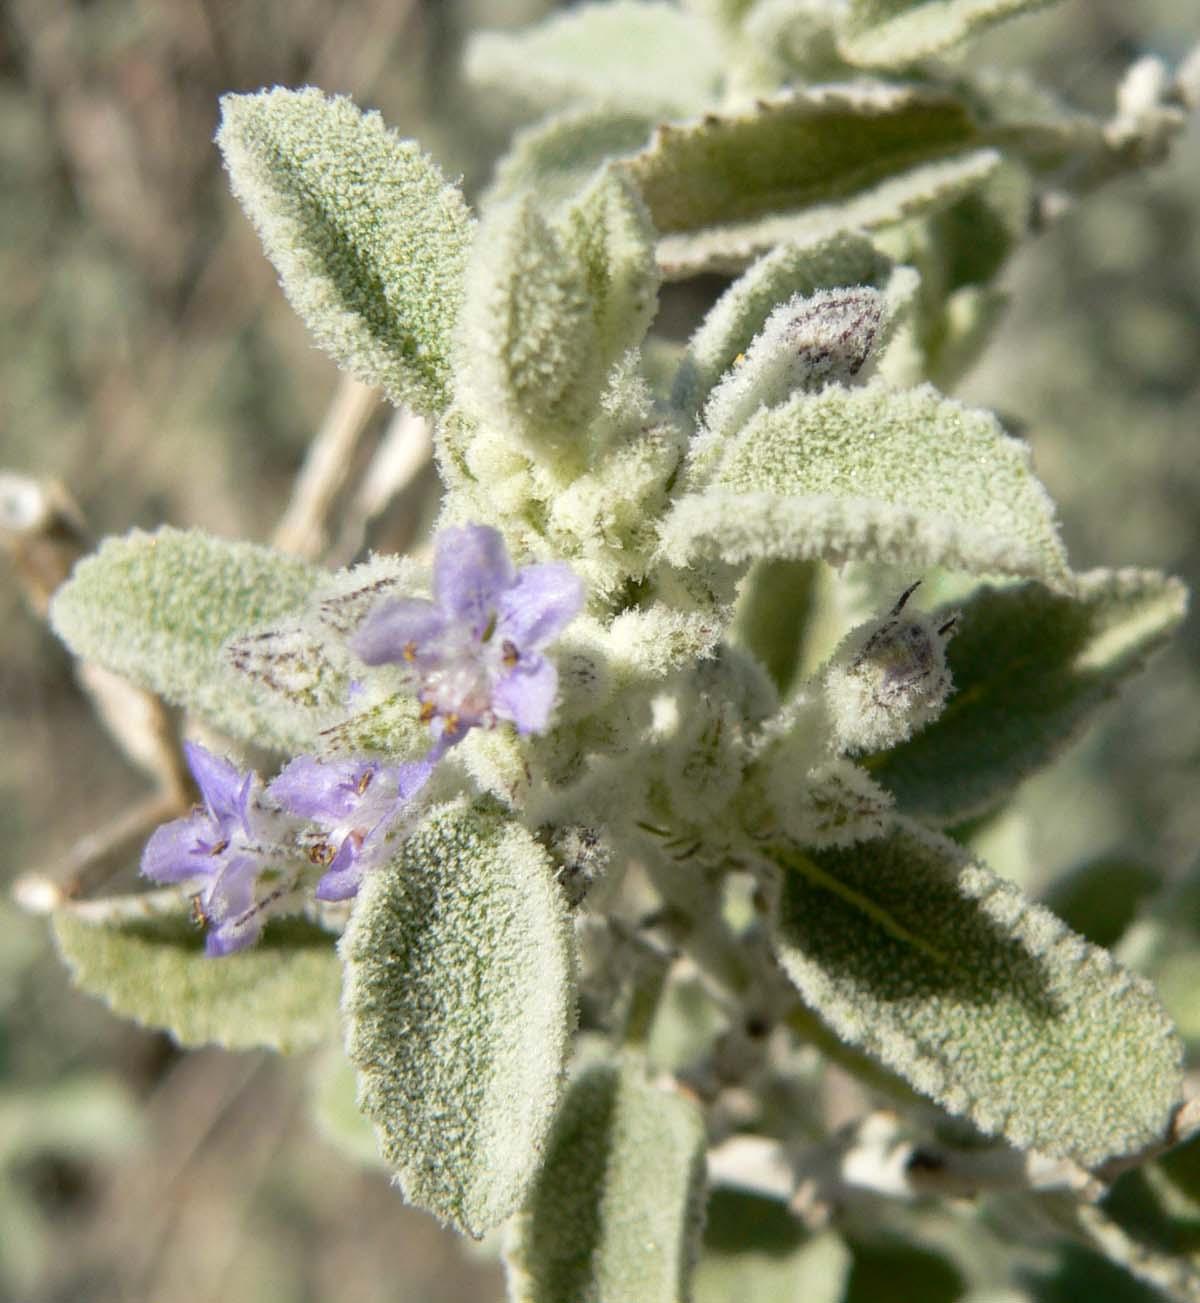 Desert lavender(Hyptis emoryi) - Now known as Condea emoryi. Excellent nectar plant. Larval food plant for the Gray Hairstreak (Strymon melinus).